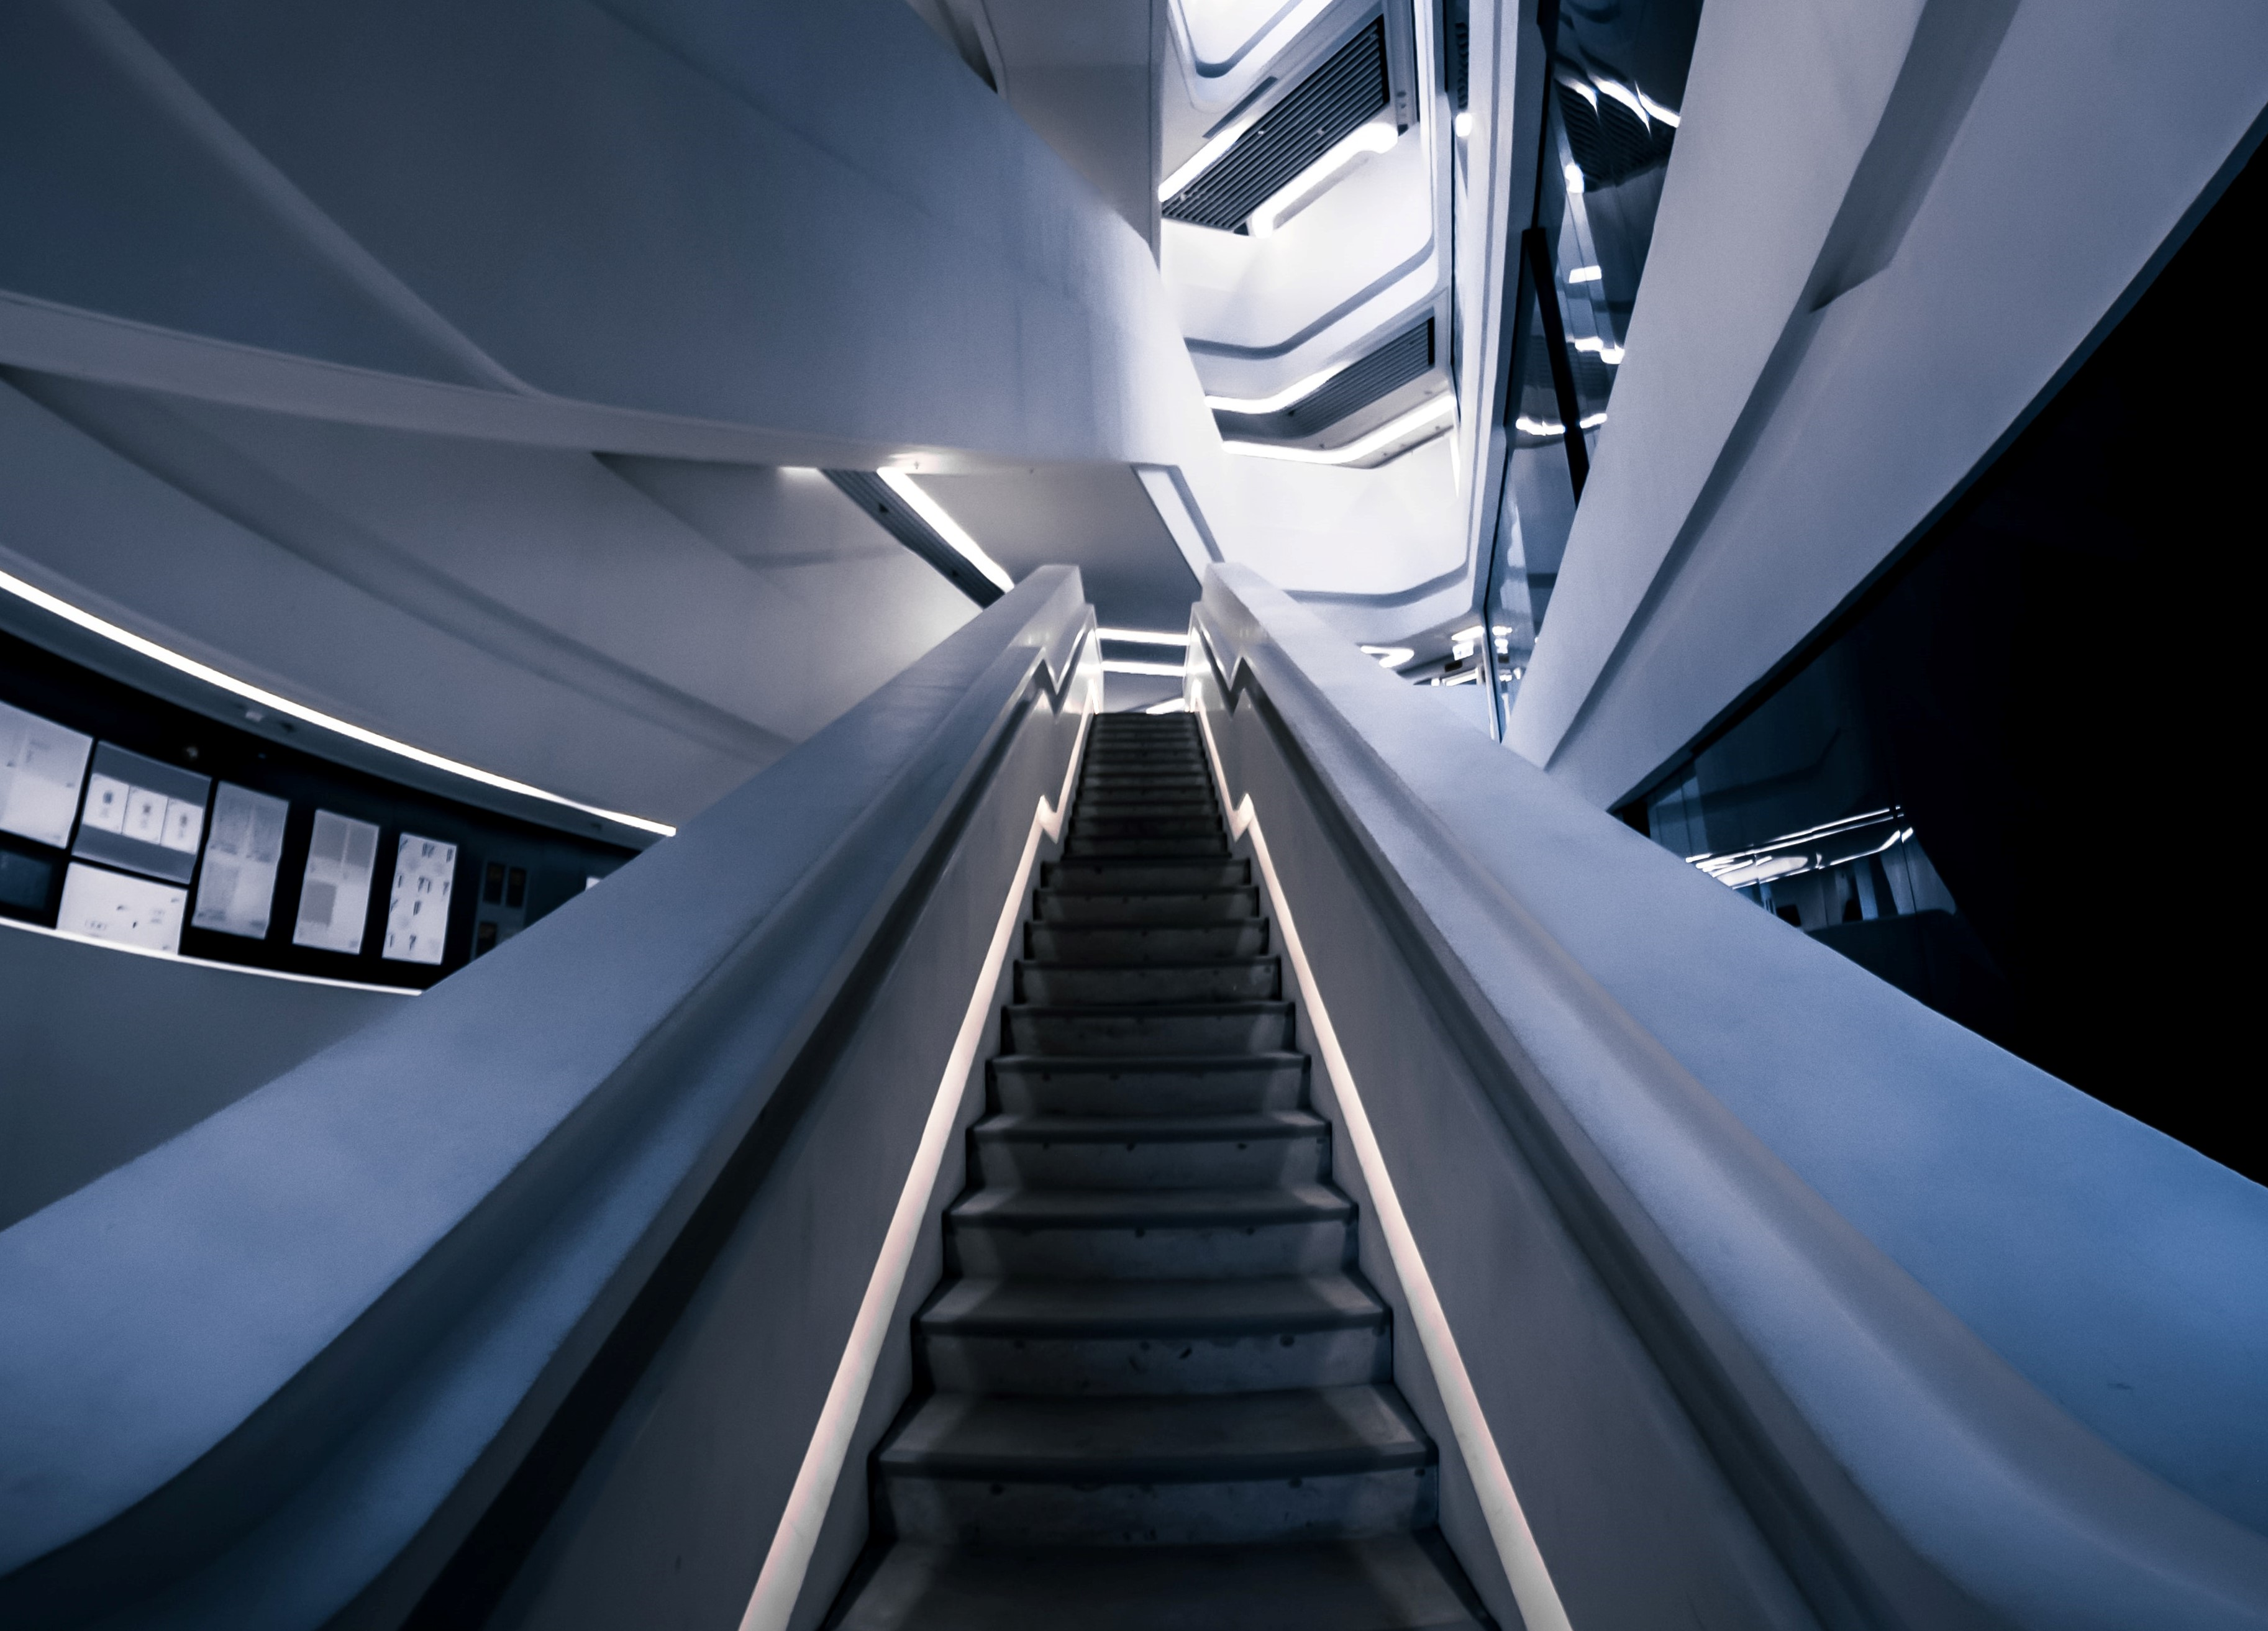 brayden-law-EsiNcJmf_uQ-unsplash_solution_Architect